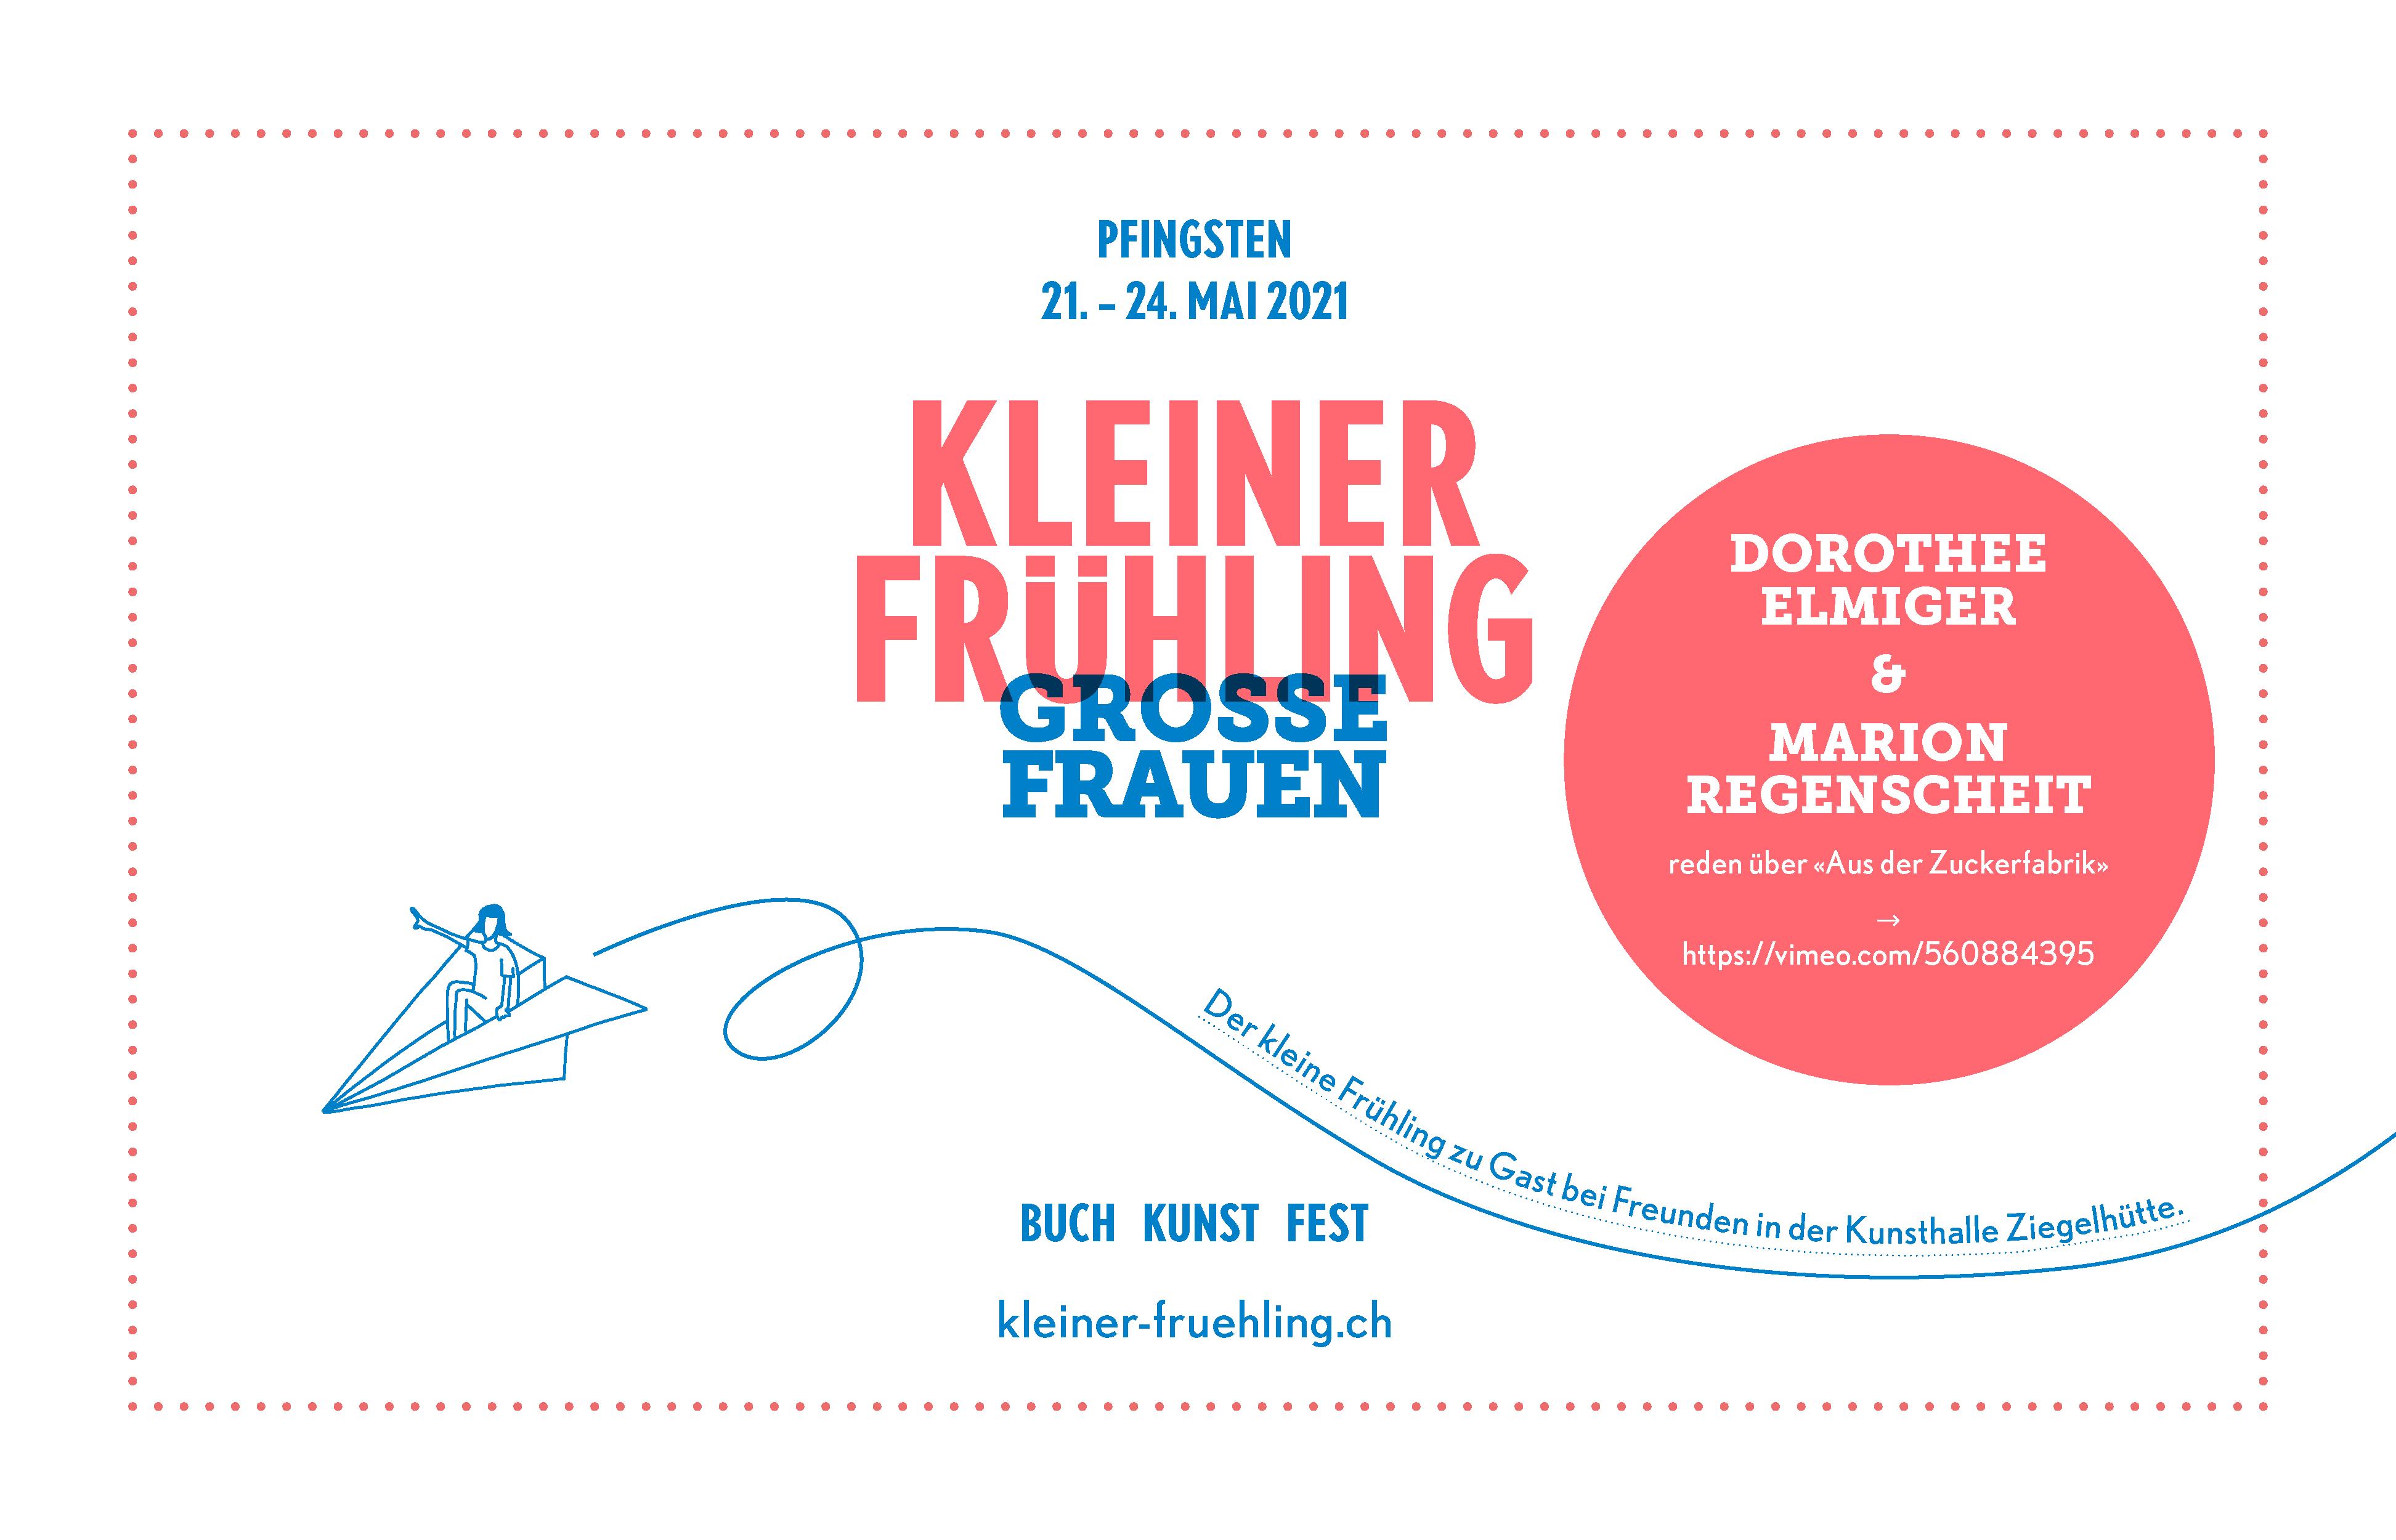 Save the Date – Kleiner Frühling 2021 in Appenzell